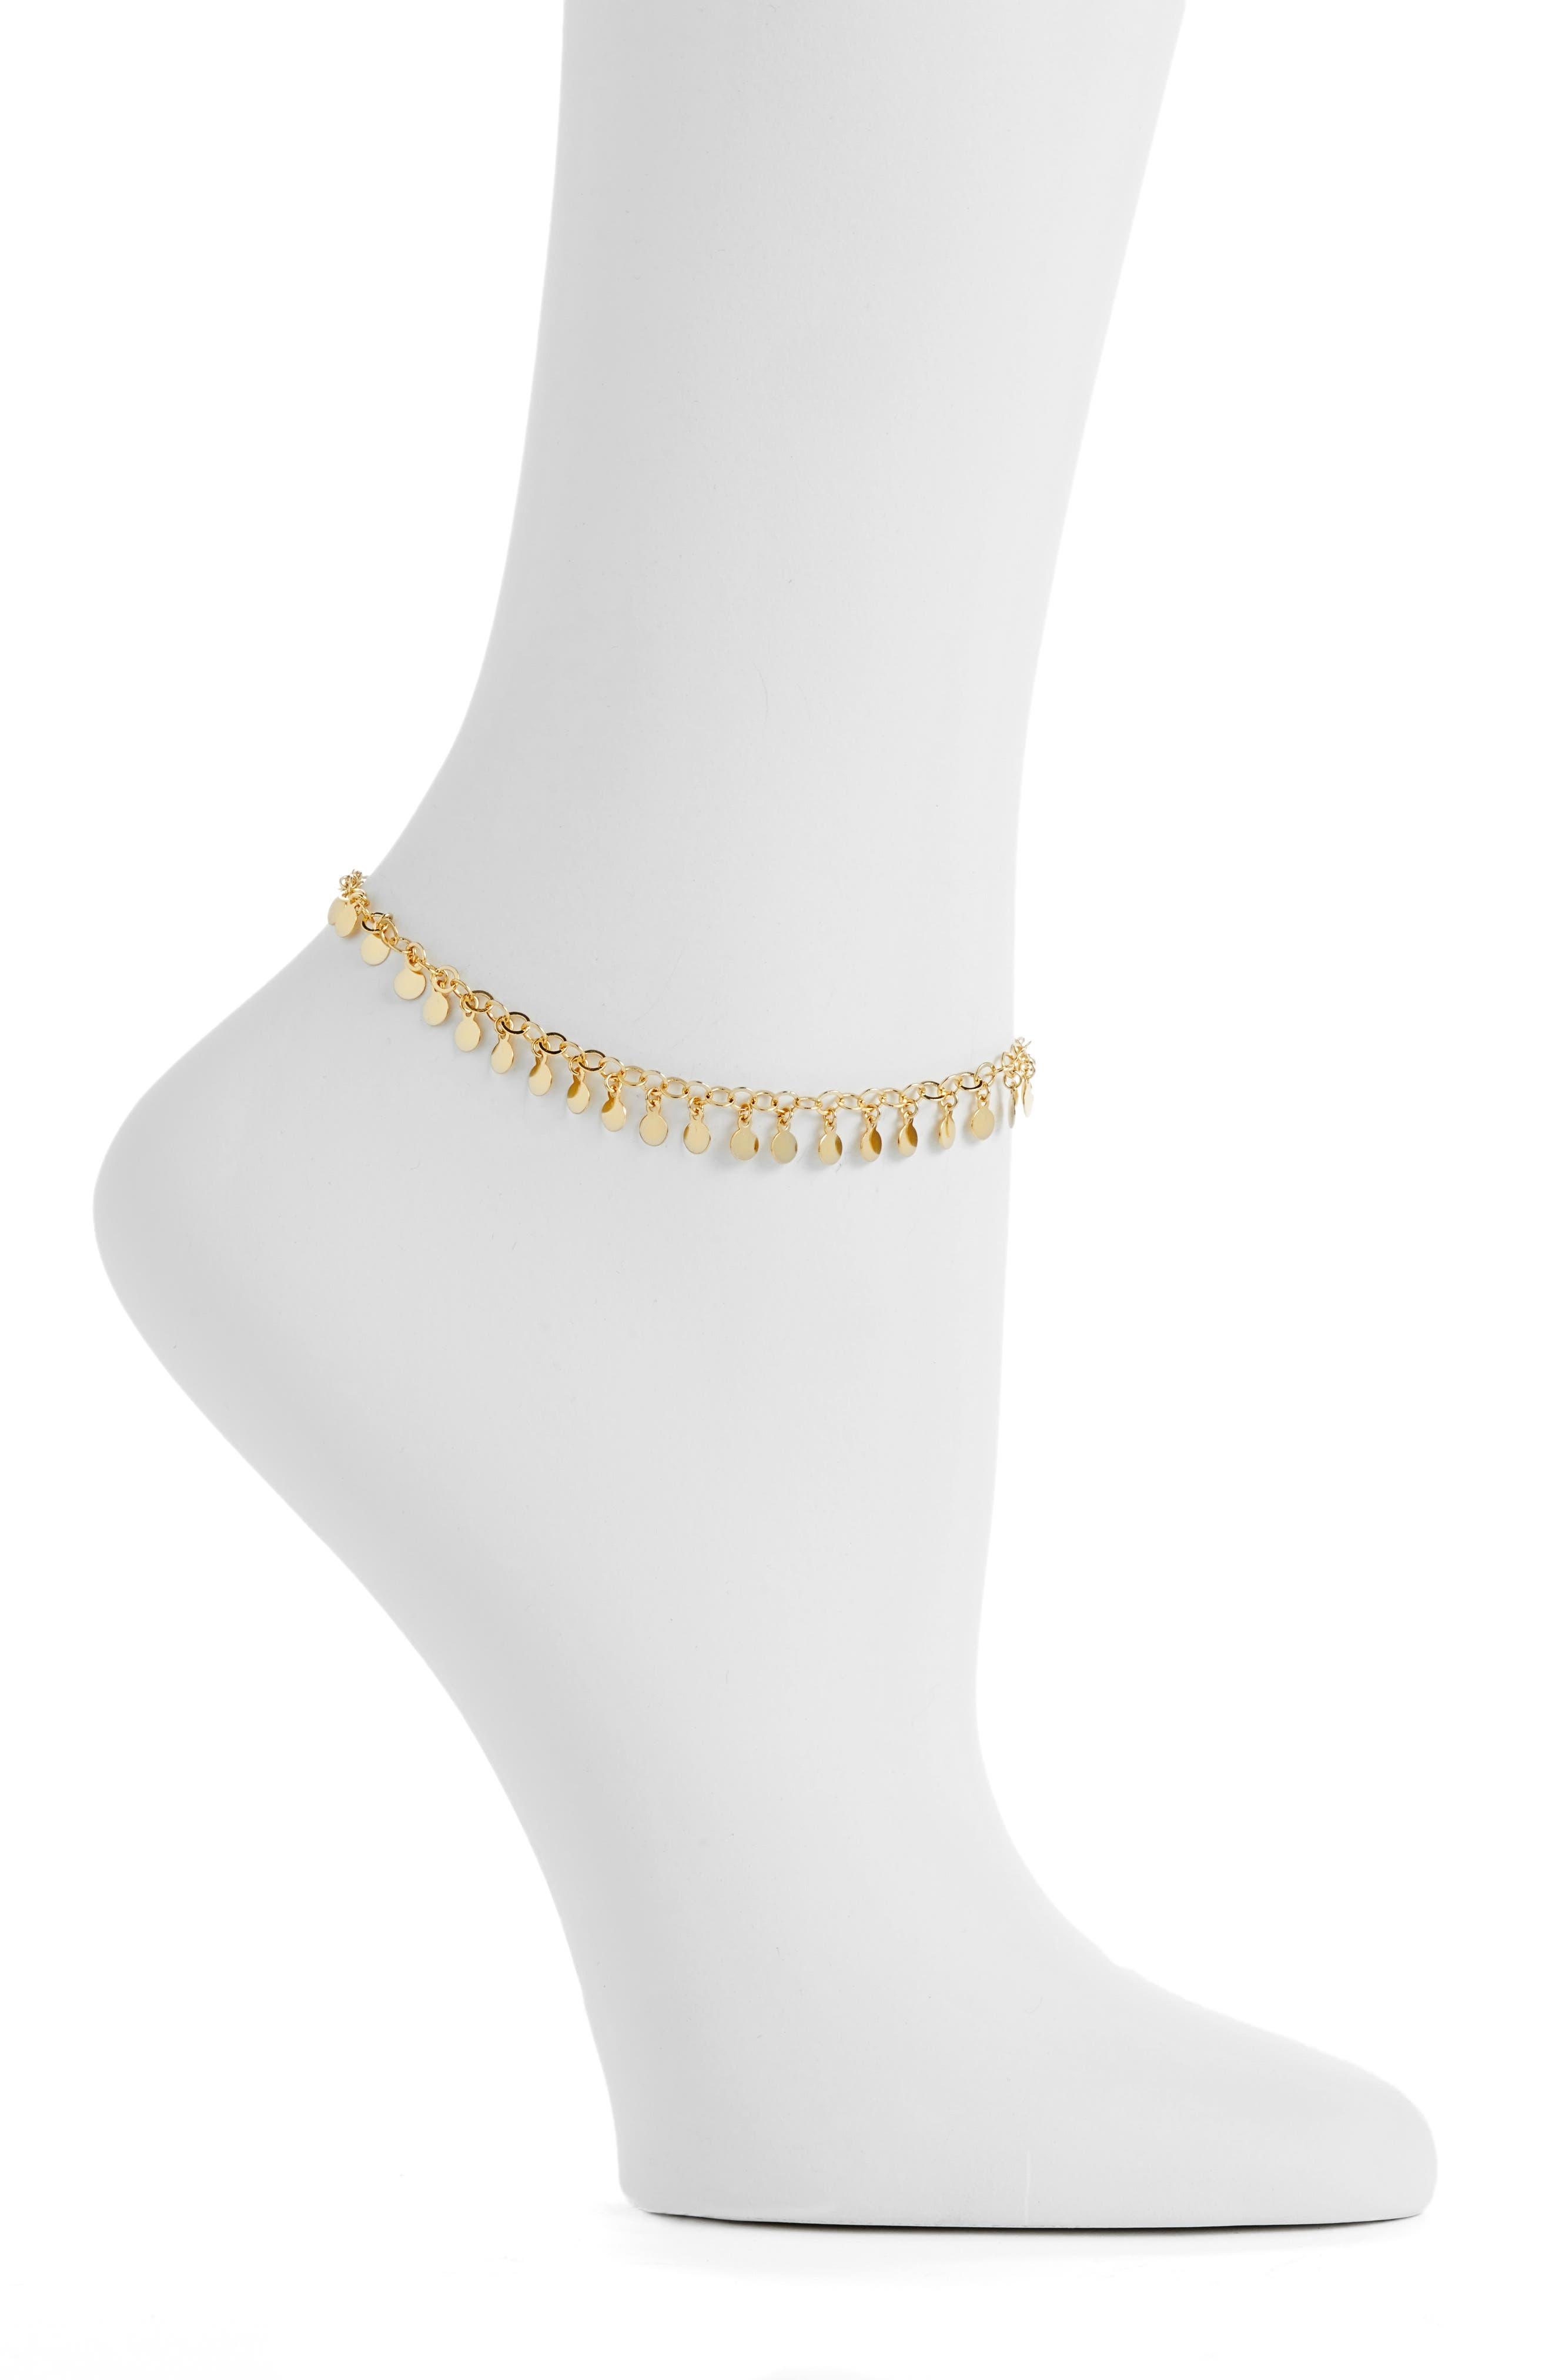 Carmen Chain Anklet,                         Main,                         color, GOLD